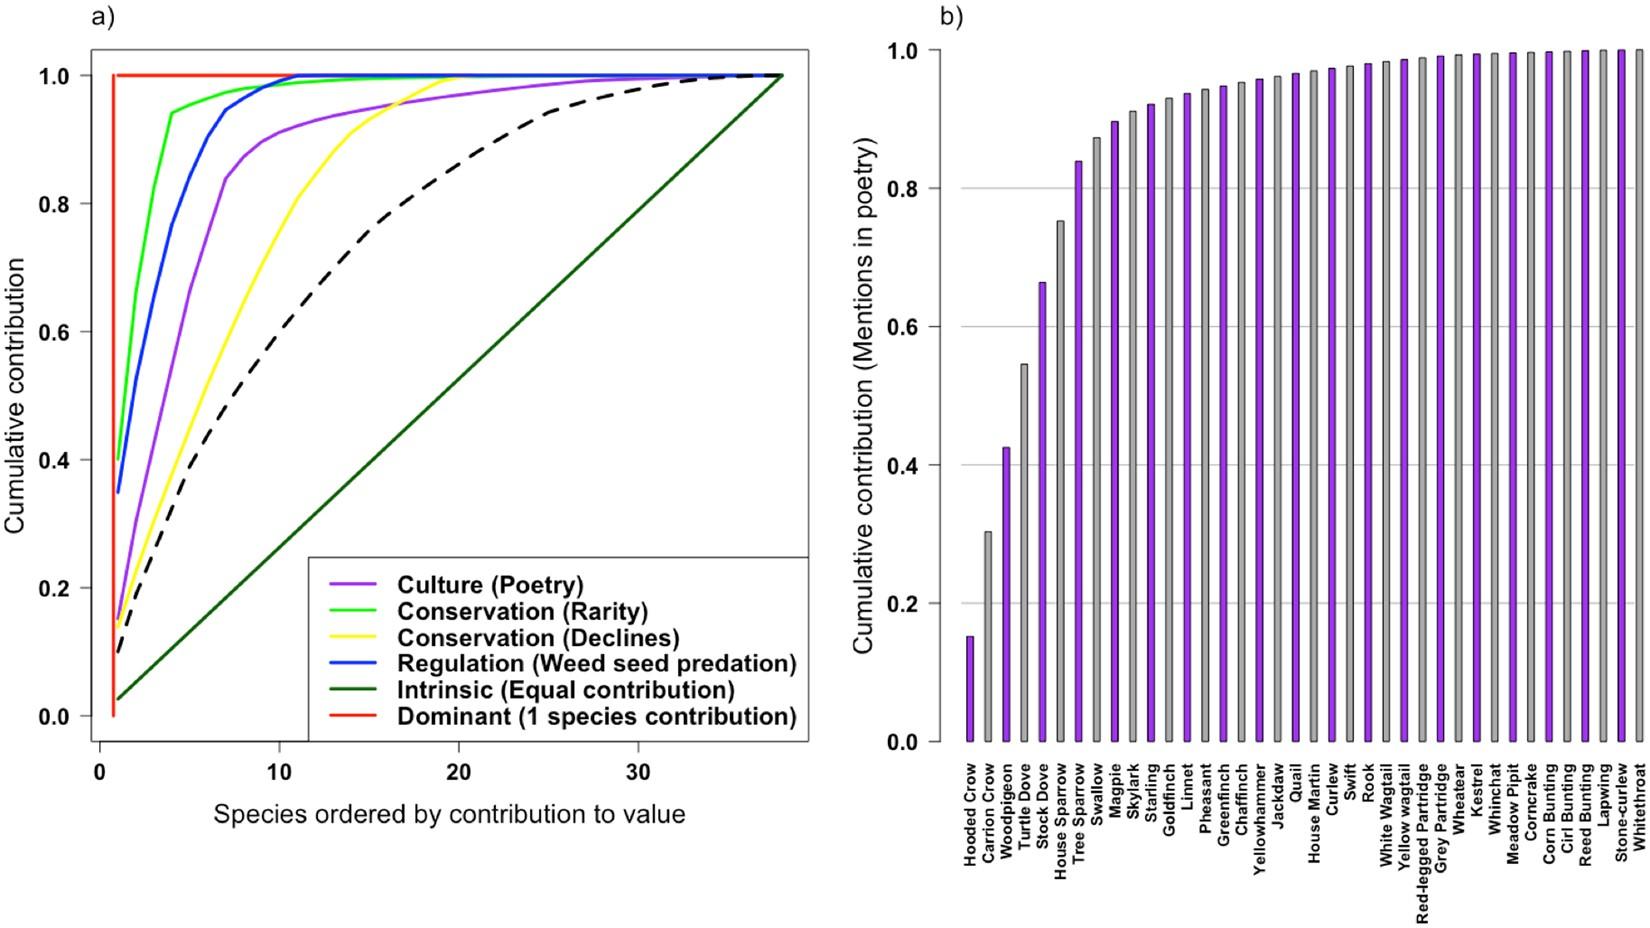 Species contributions to single biodiversity values under